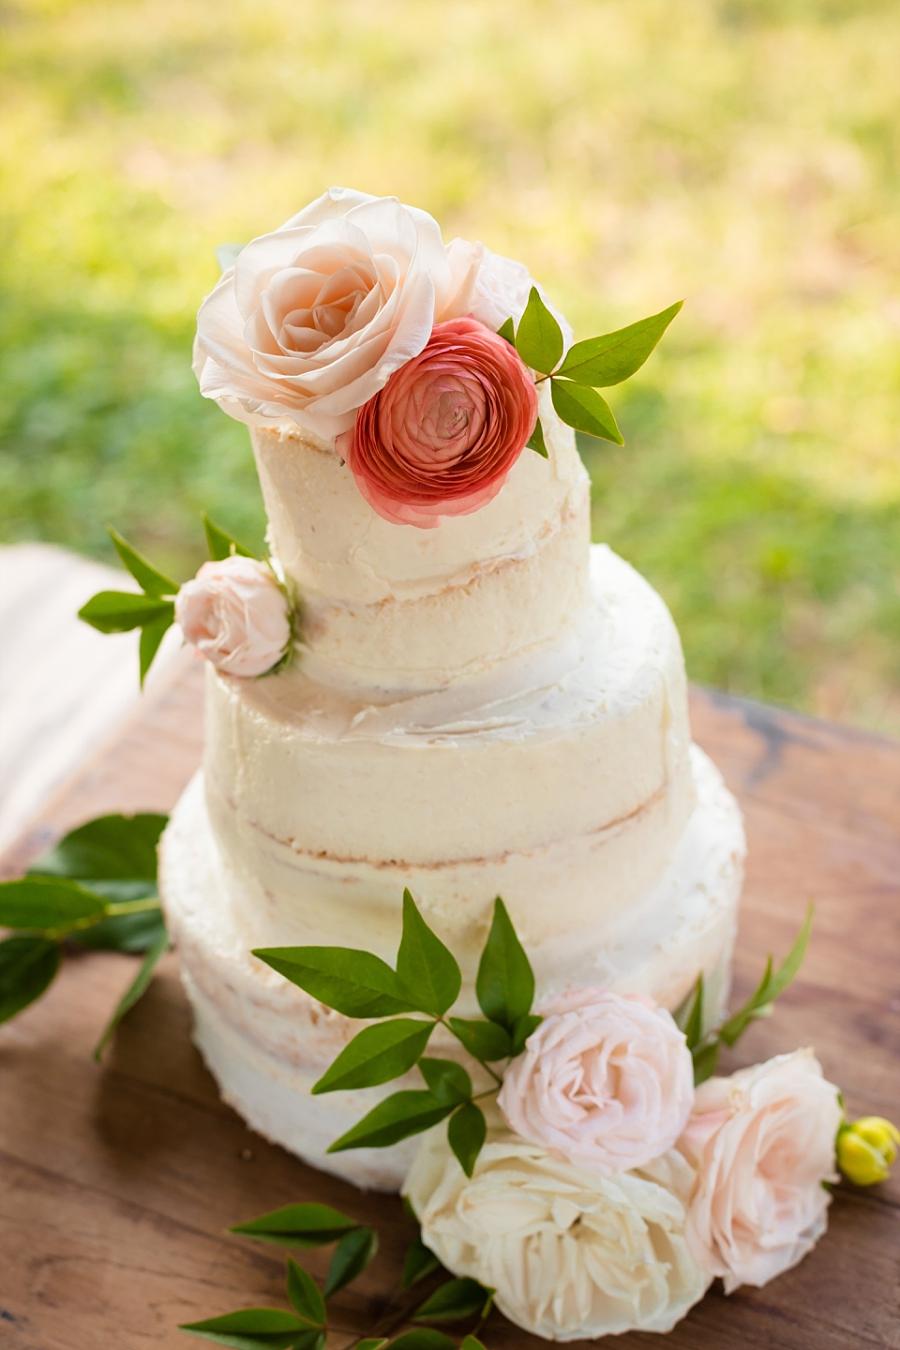 Stacy-Anderson-Photography-Nashville-Houston-Destination-Wedding-Photographer_0013-1.jpg